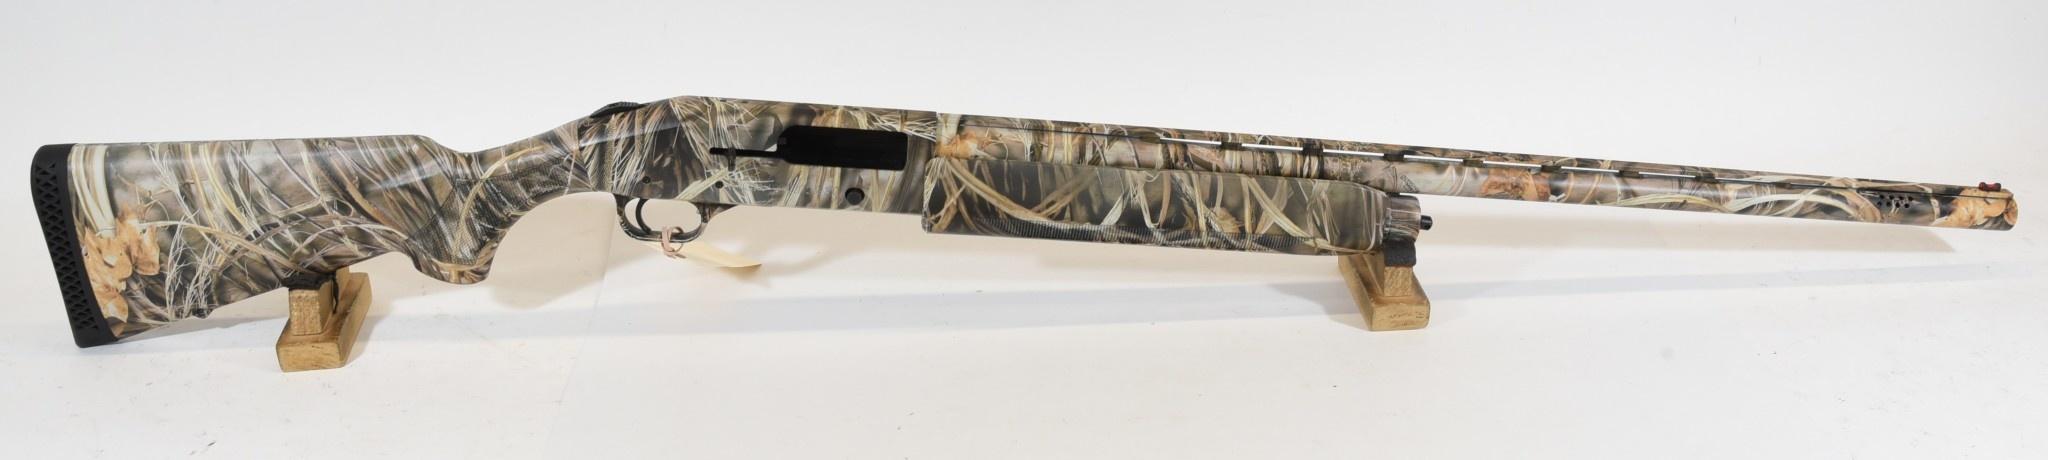 "UG-14286 USED Mossberg 930 12 Gauge  3"" Chamber Semi-Auto Shotgun Max 4 Camo 3 chokes"